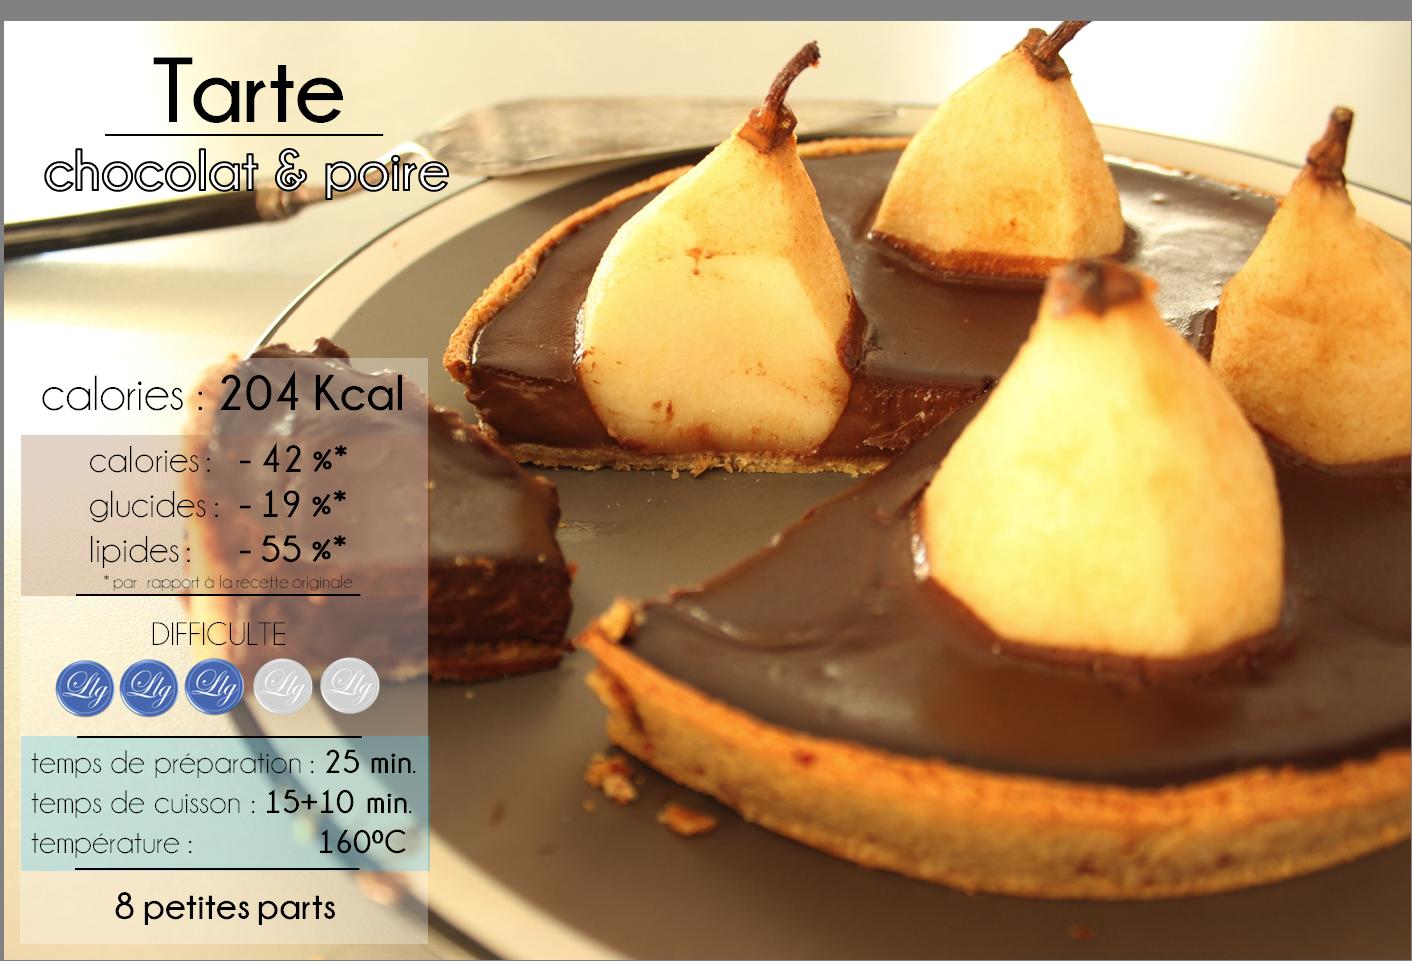 La ligne gourmande recette de la tarte au chocolat et aux poires - Recette tarte aux chocolat ...